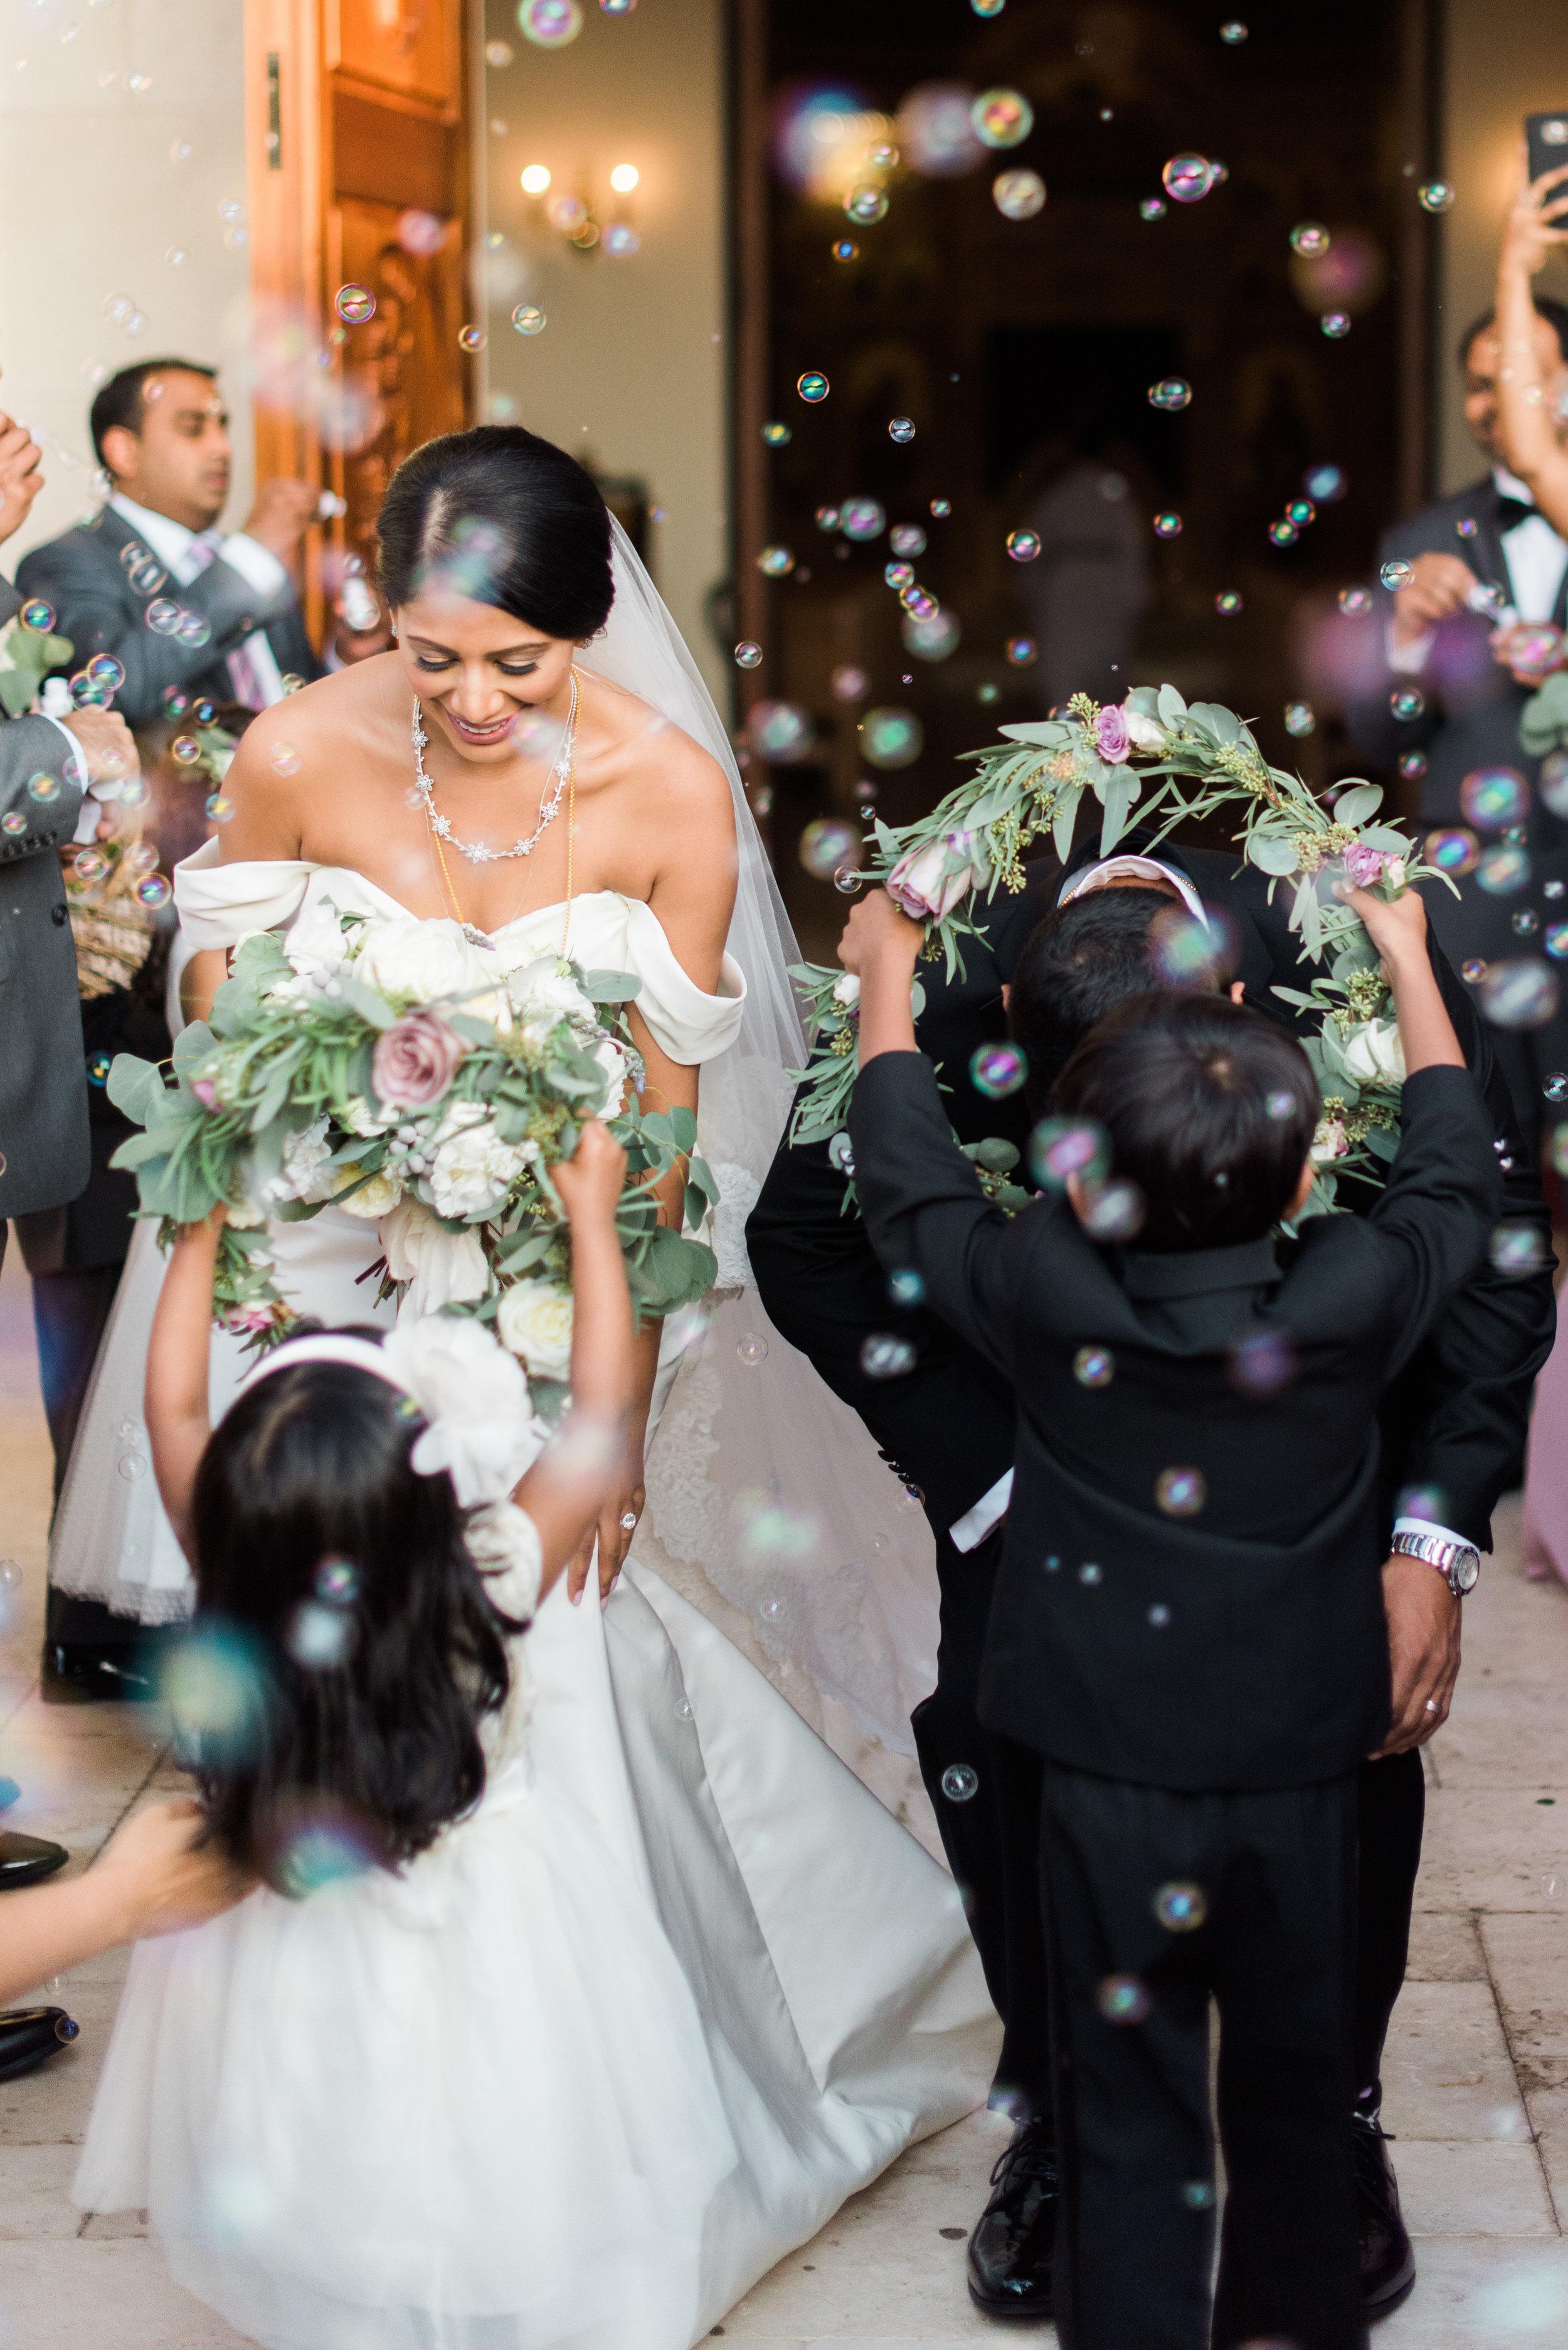 Fine-Art-Film-Houston-Wedding-Photographer-Best-Top-Luxury-Texas-Austin-Dallas-Destination-Dana-Fernandez-Photography-The-Bell-Tower-on-34th-Indian-20.jpg